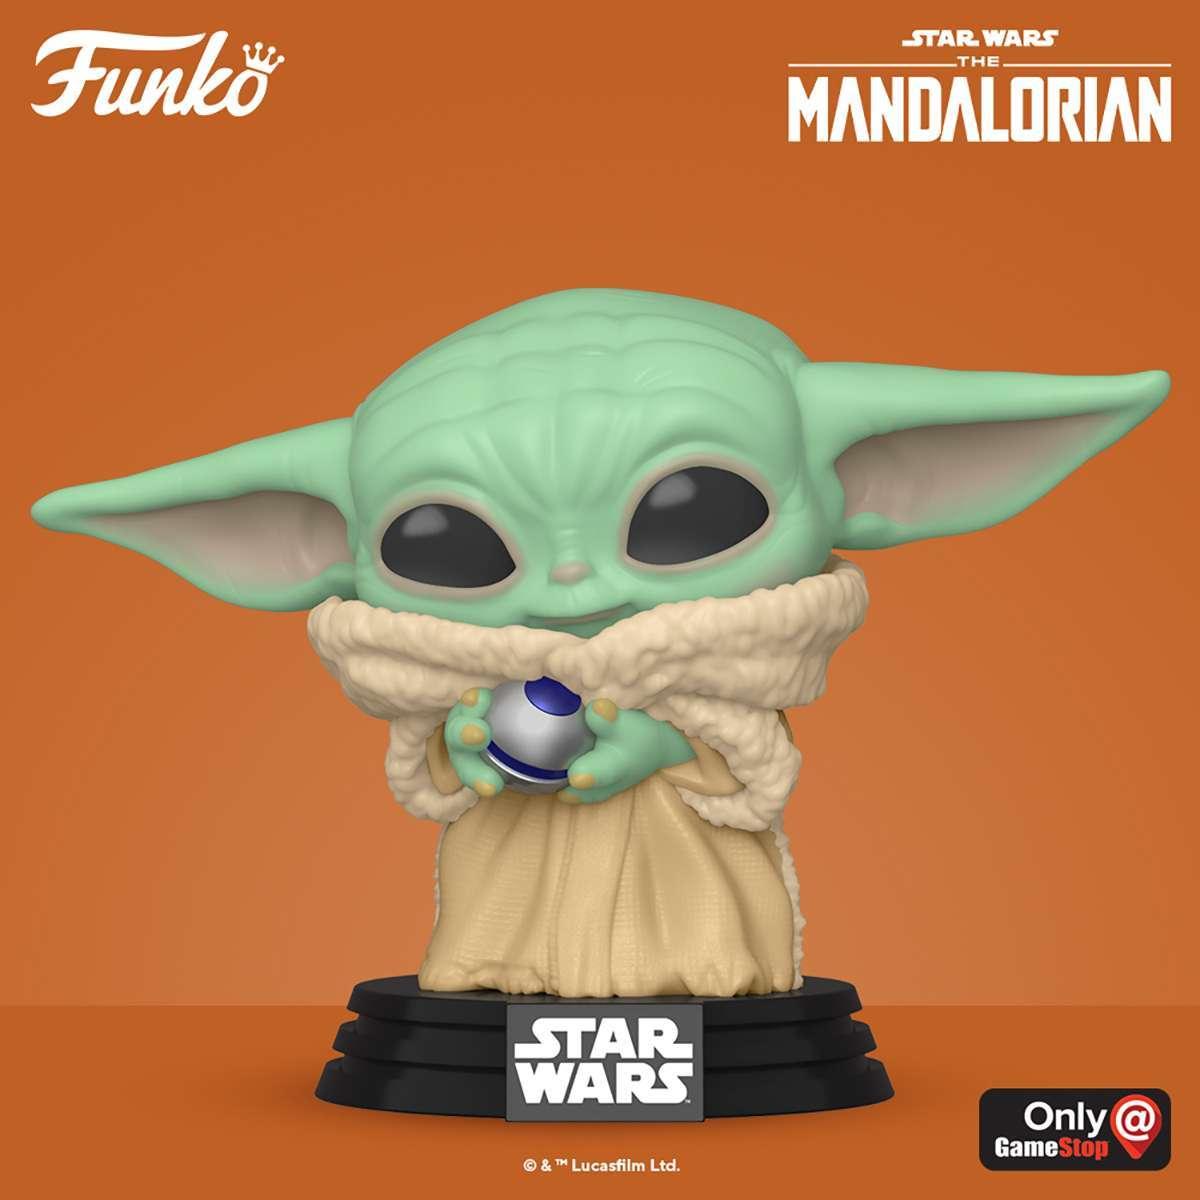 Funko Pop The Child With Control Knob! Mandolorian Series Star Wars!!